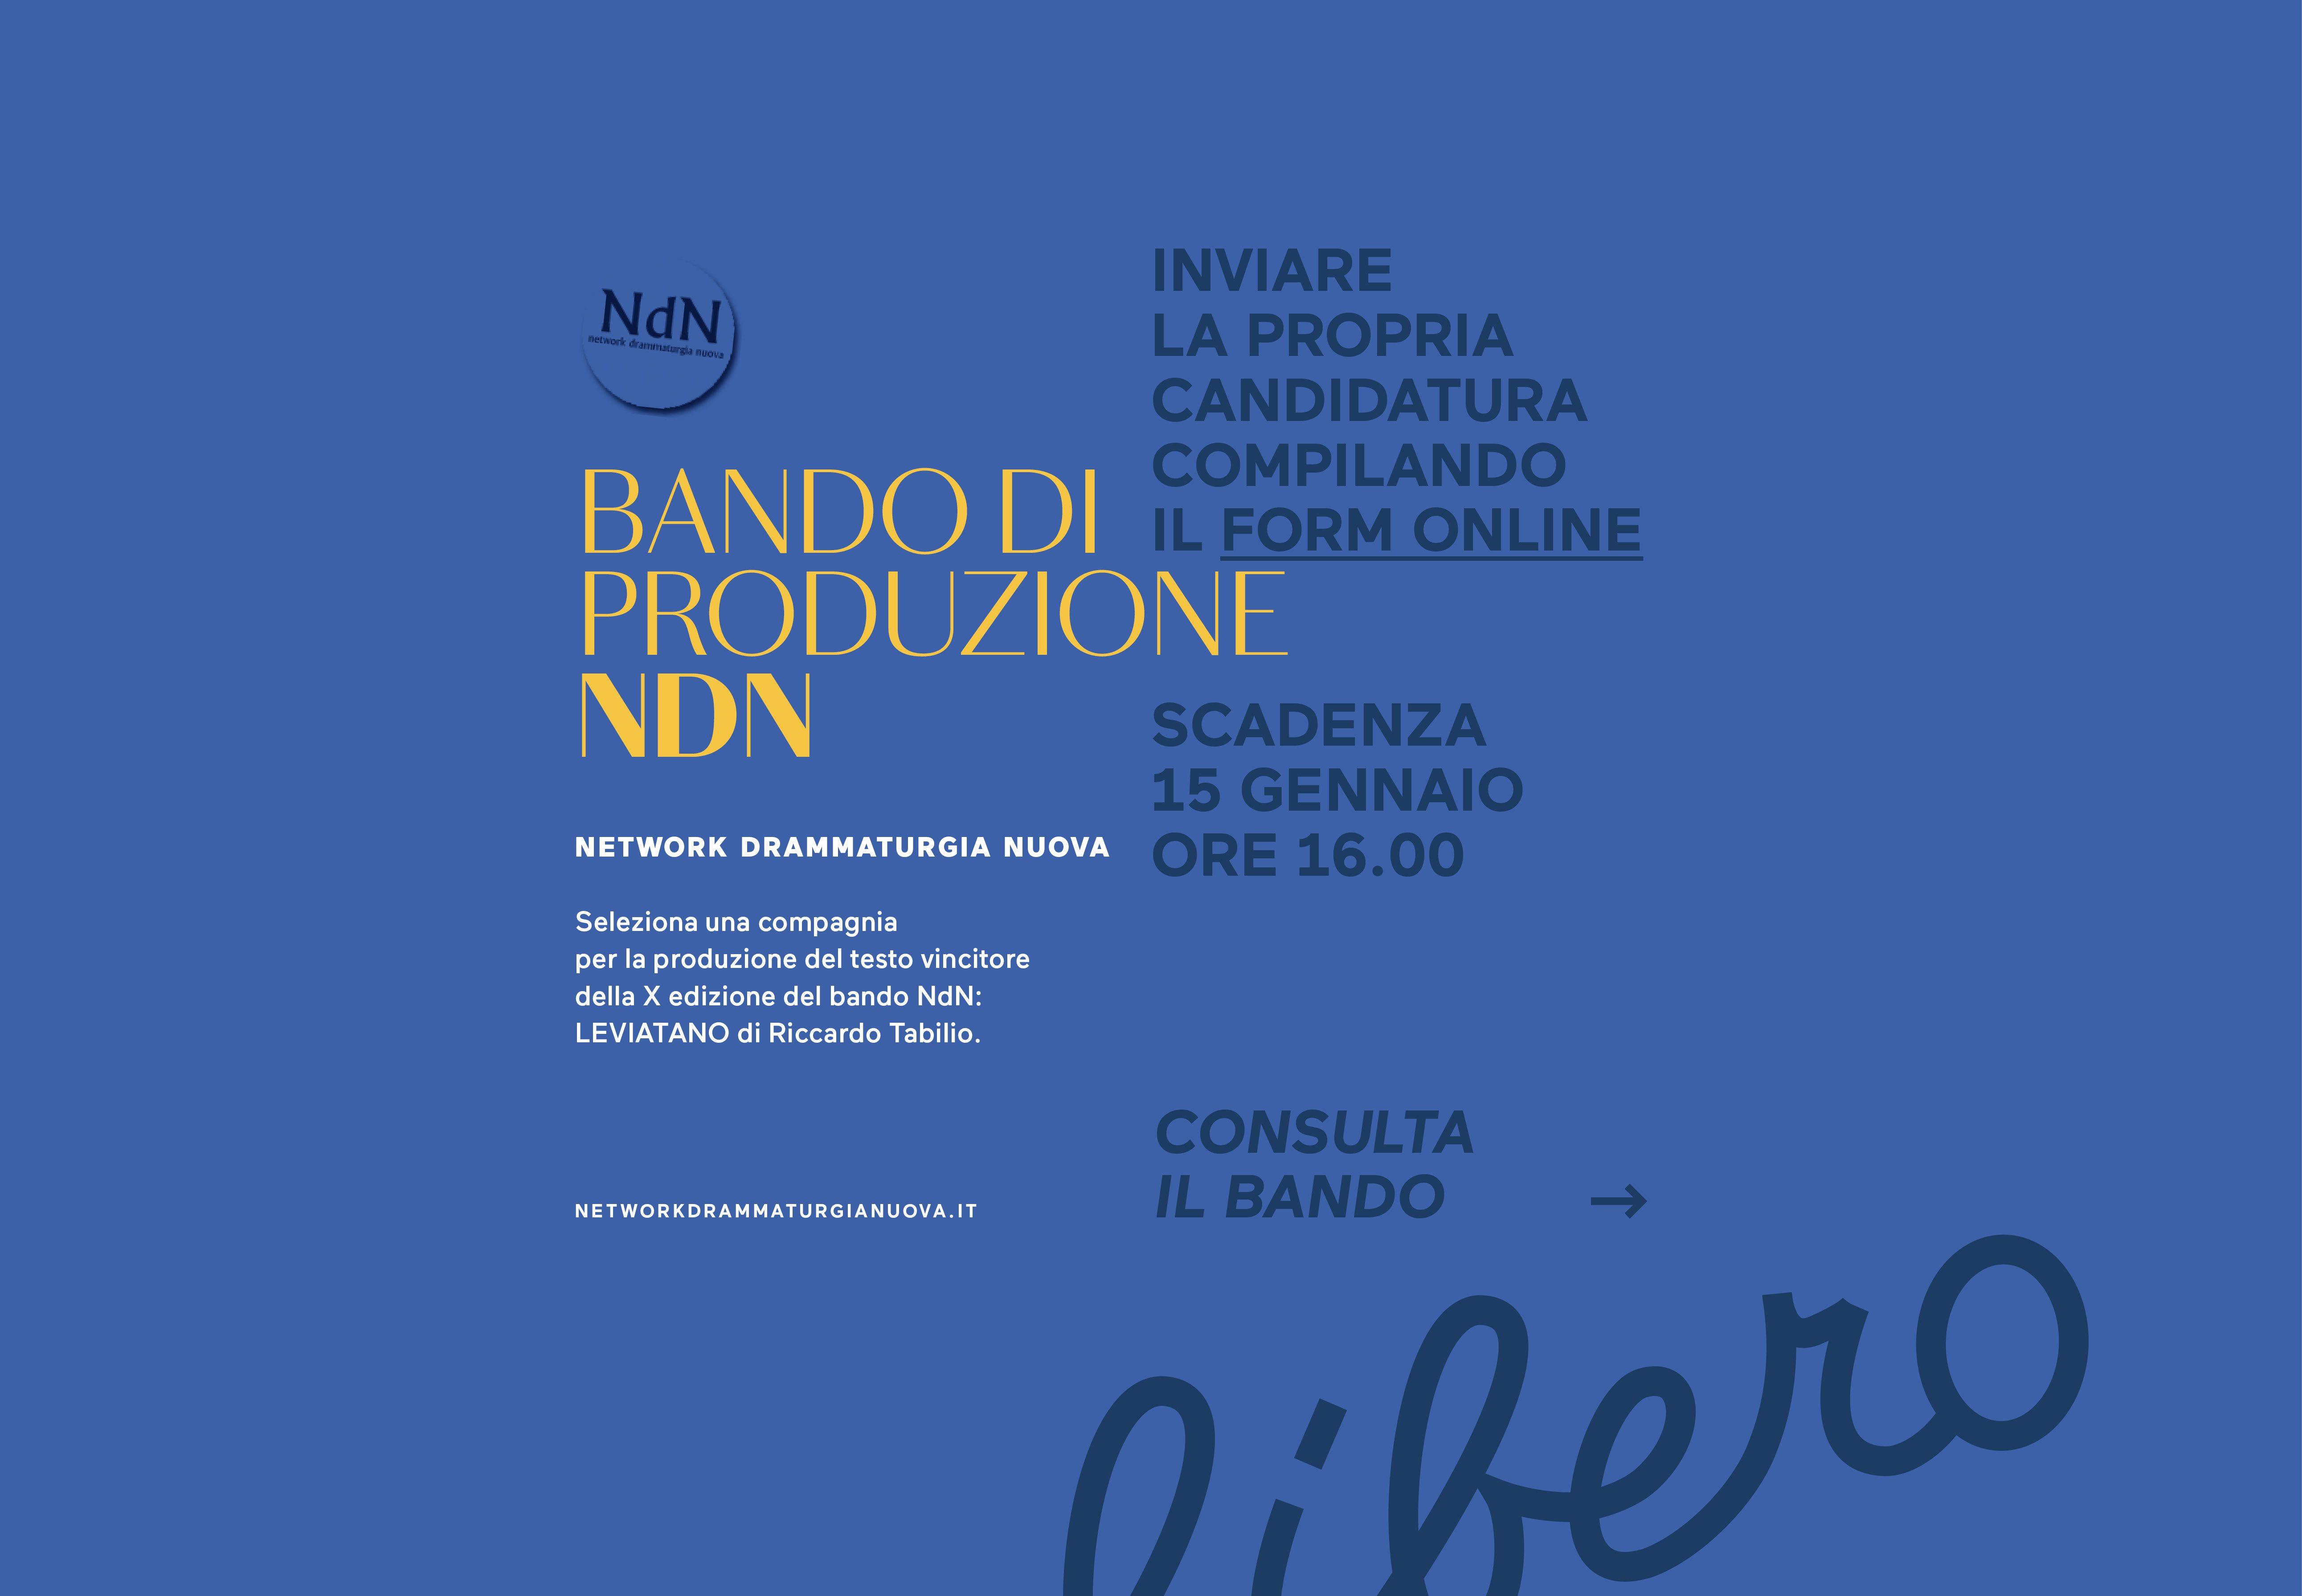 Bando – NdN Network drammaturgia Nuova